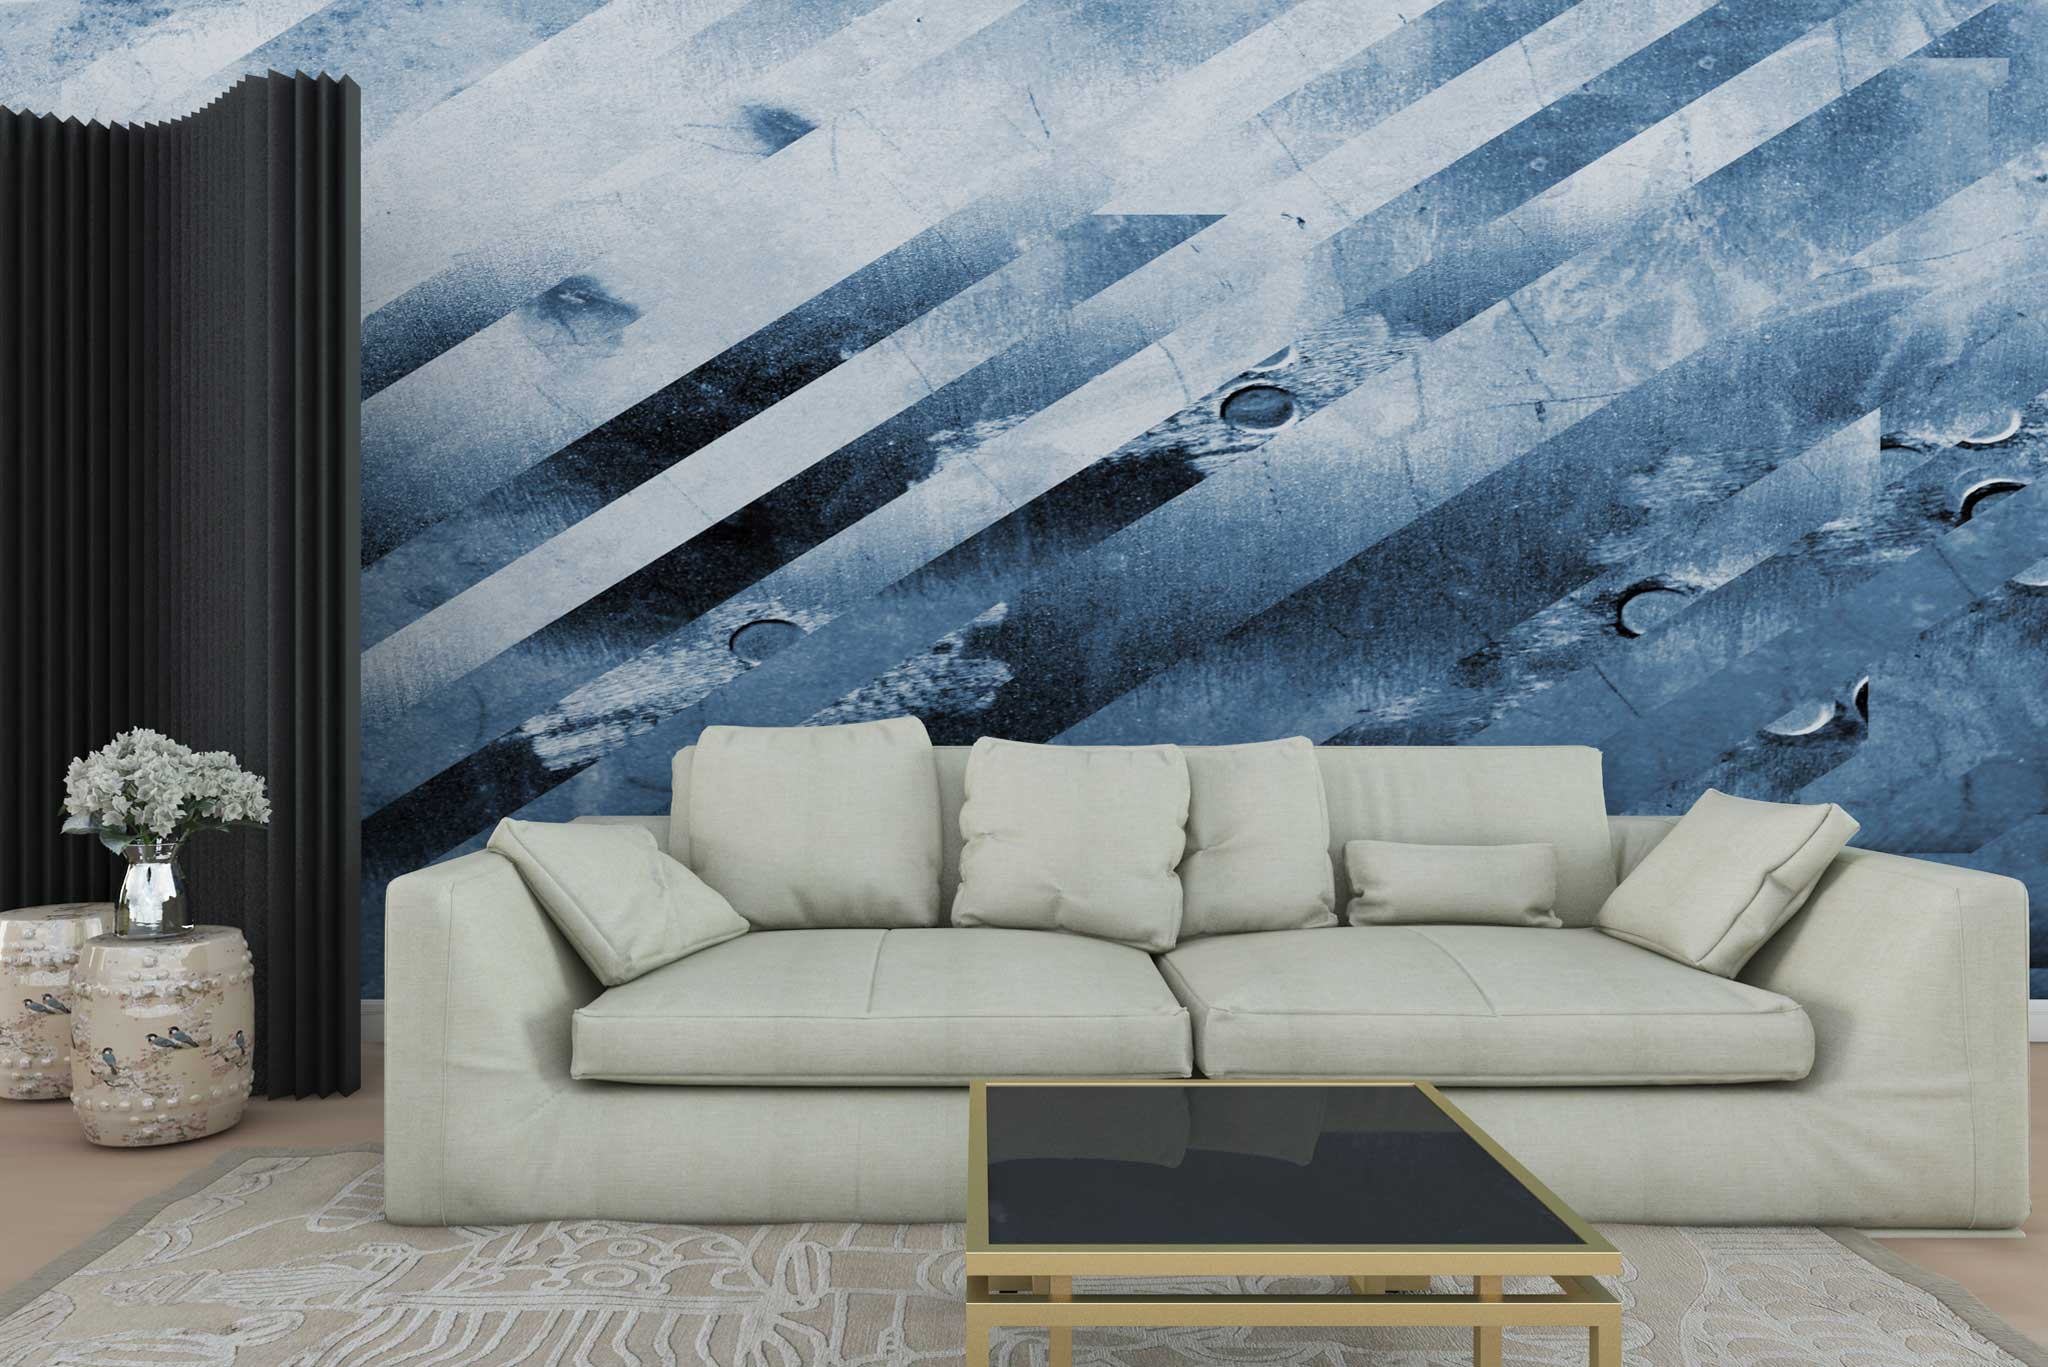 tapet-fototapet-personalizat-comanda-bucuresti-pictura-abstracta-grafic-model-geometric-linii-oblice-albastru-perete-lux-special